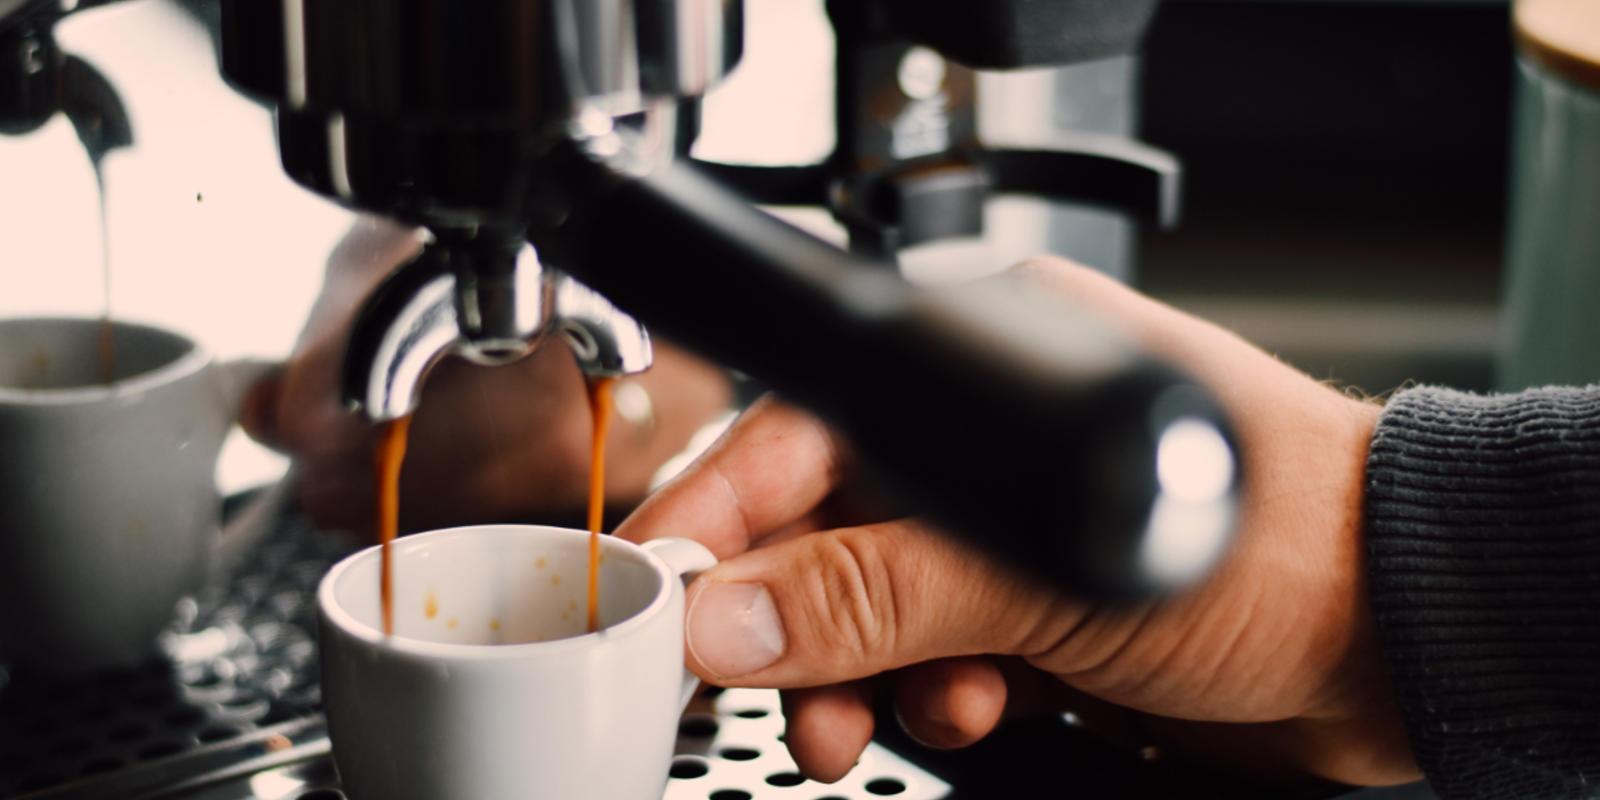 koffiemachine vergelijken